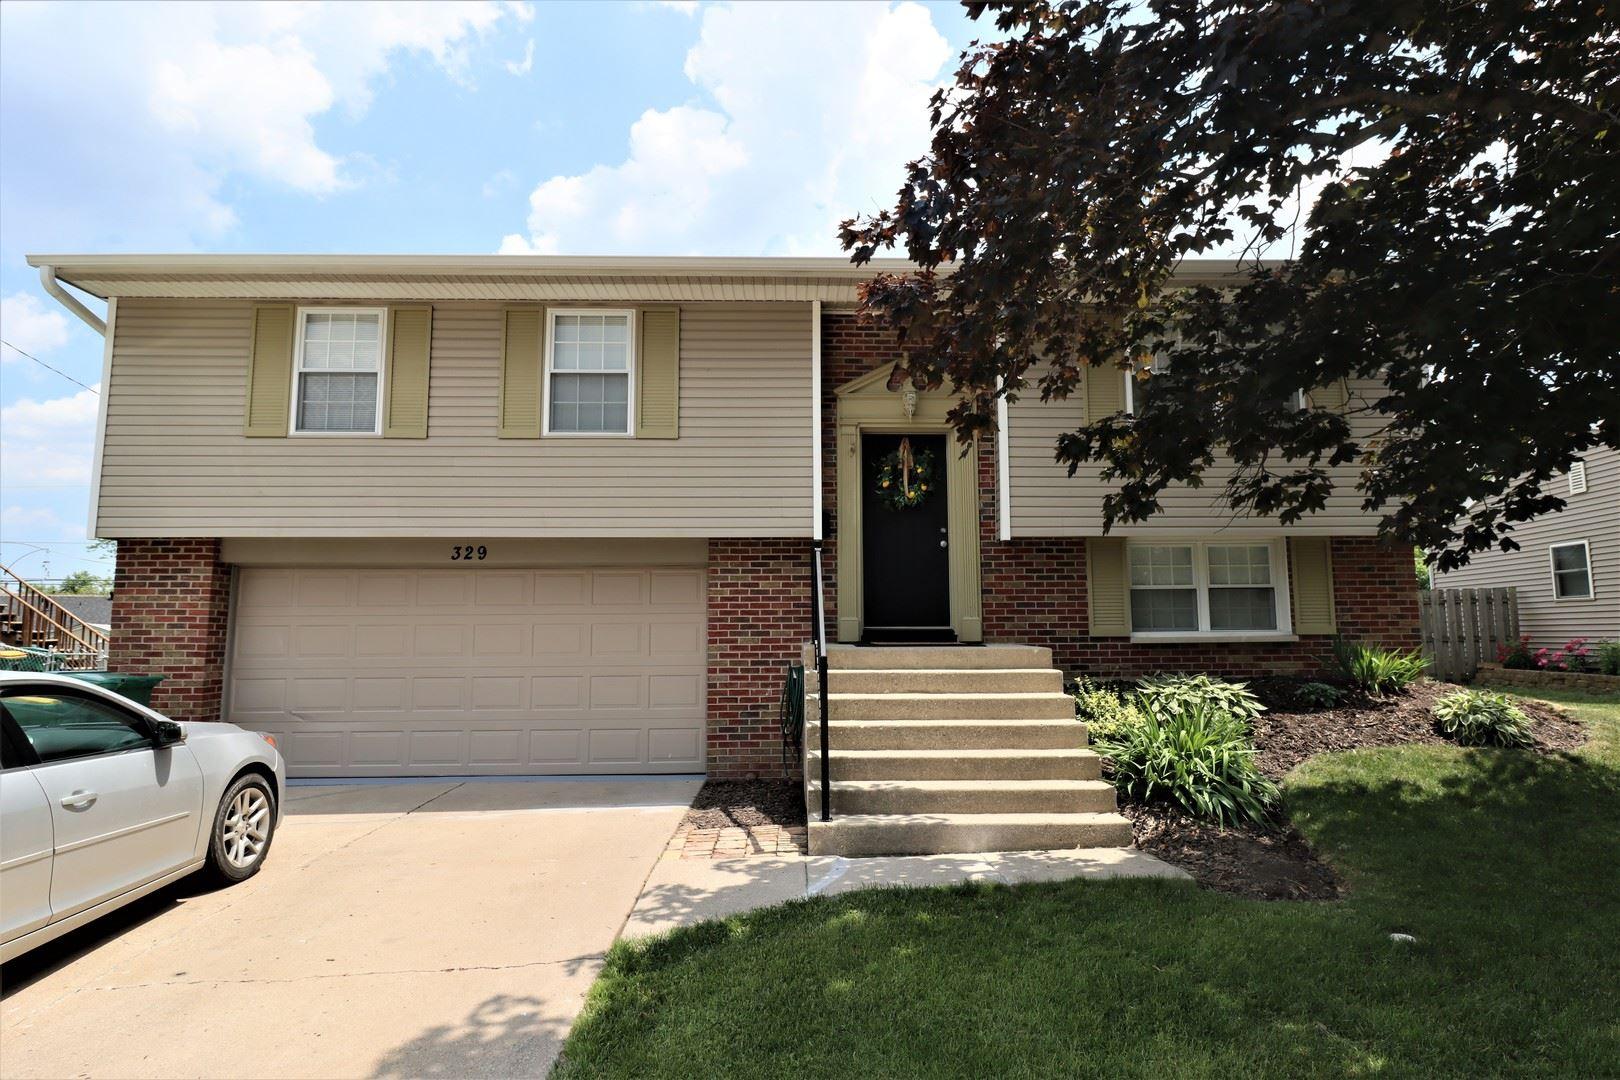 Photo of 329 Hickory Avenue, Romeoville, IL 60446 (MLS # 11124687)